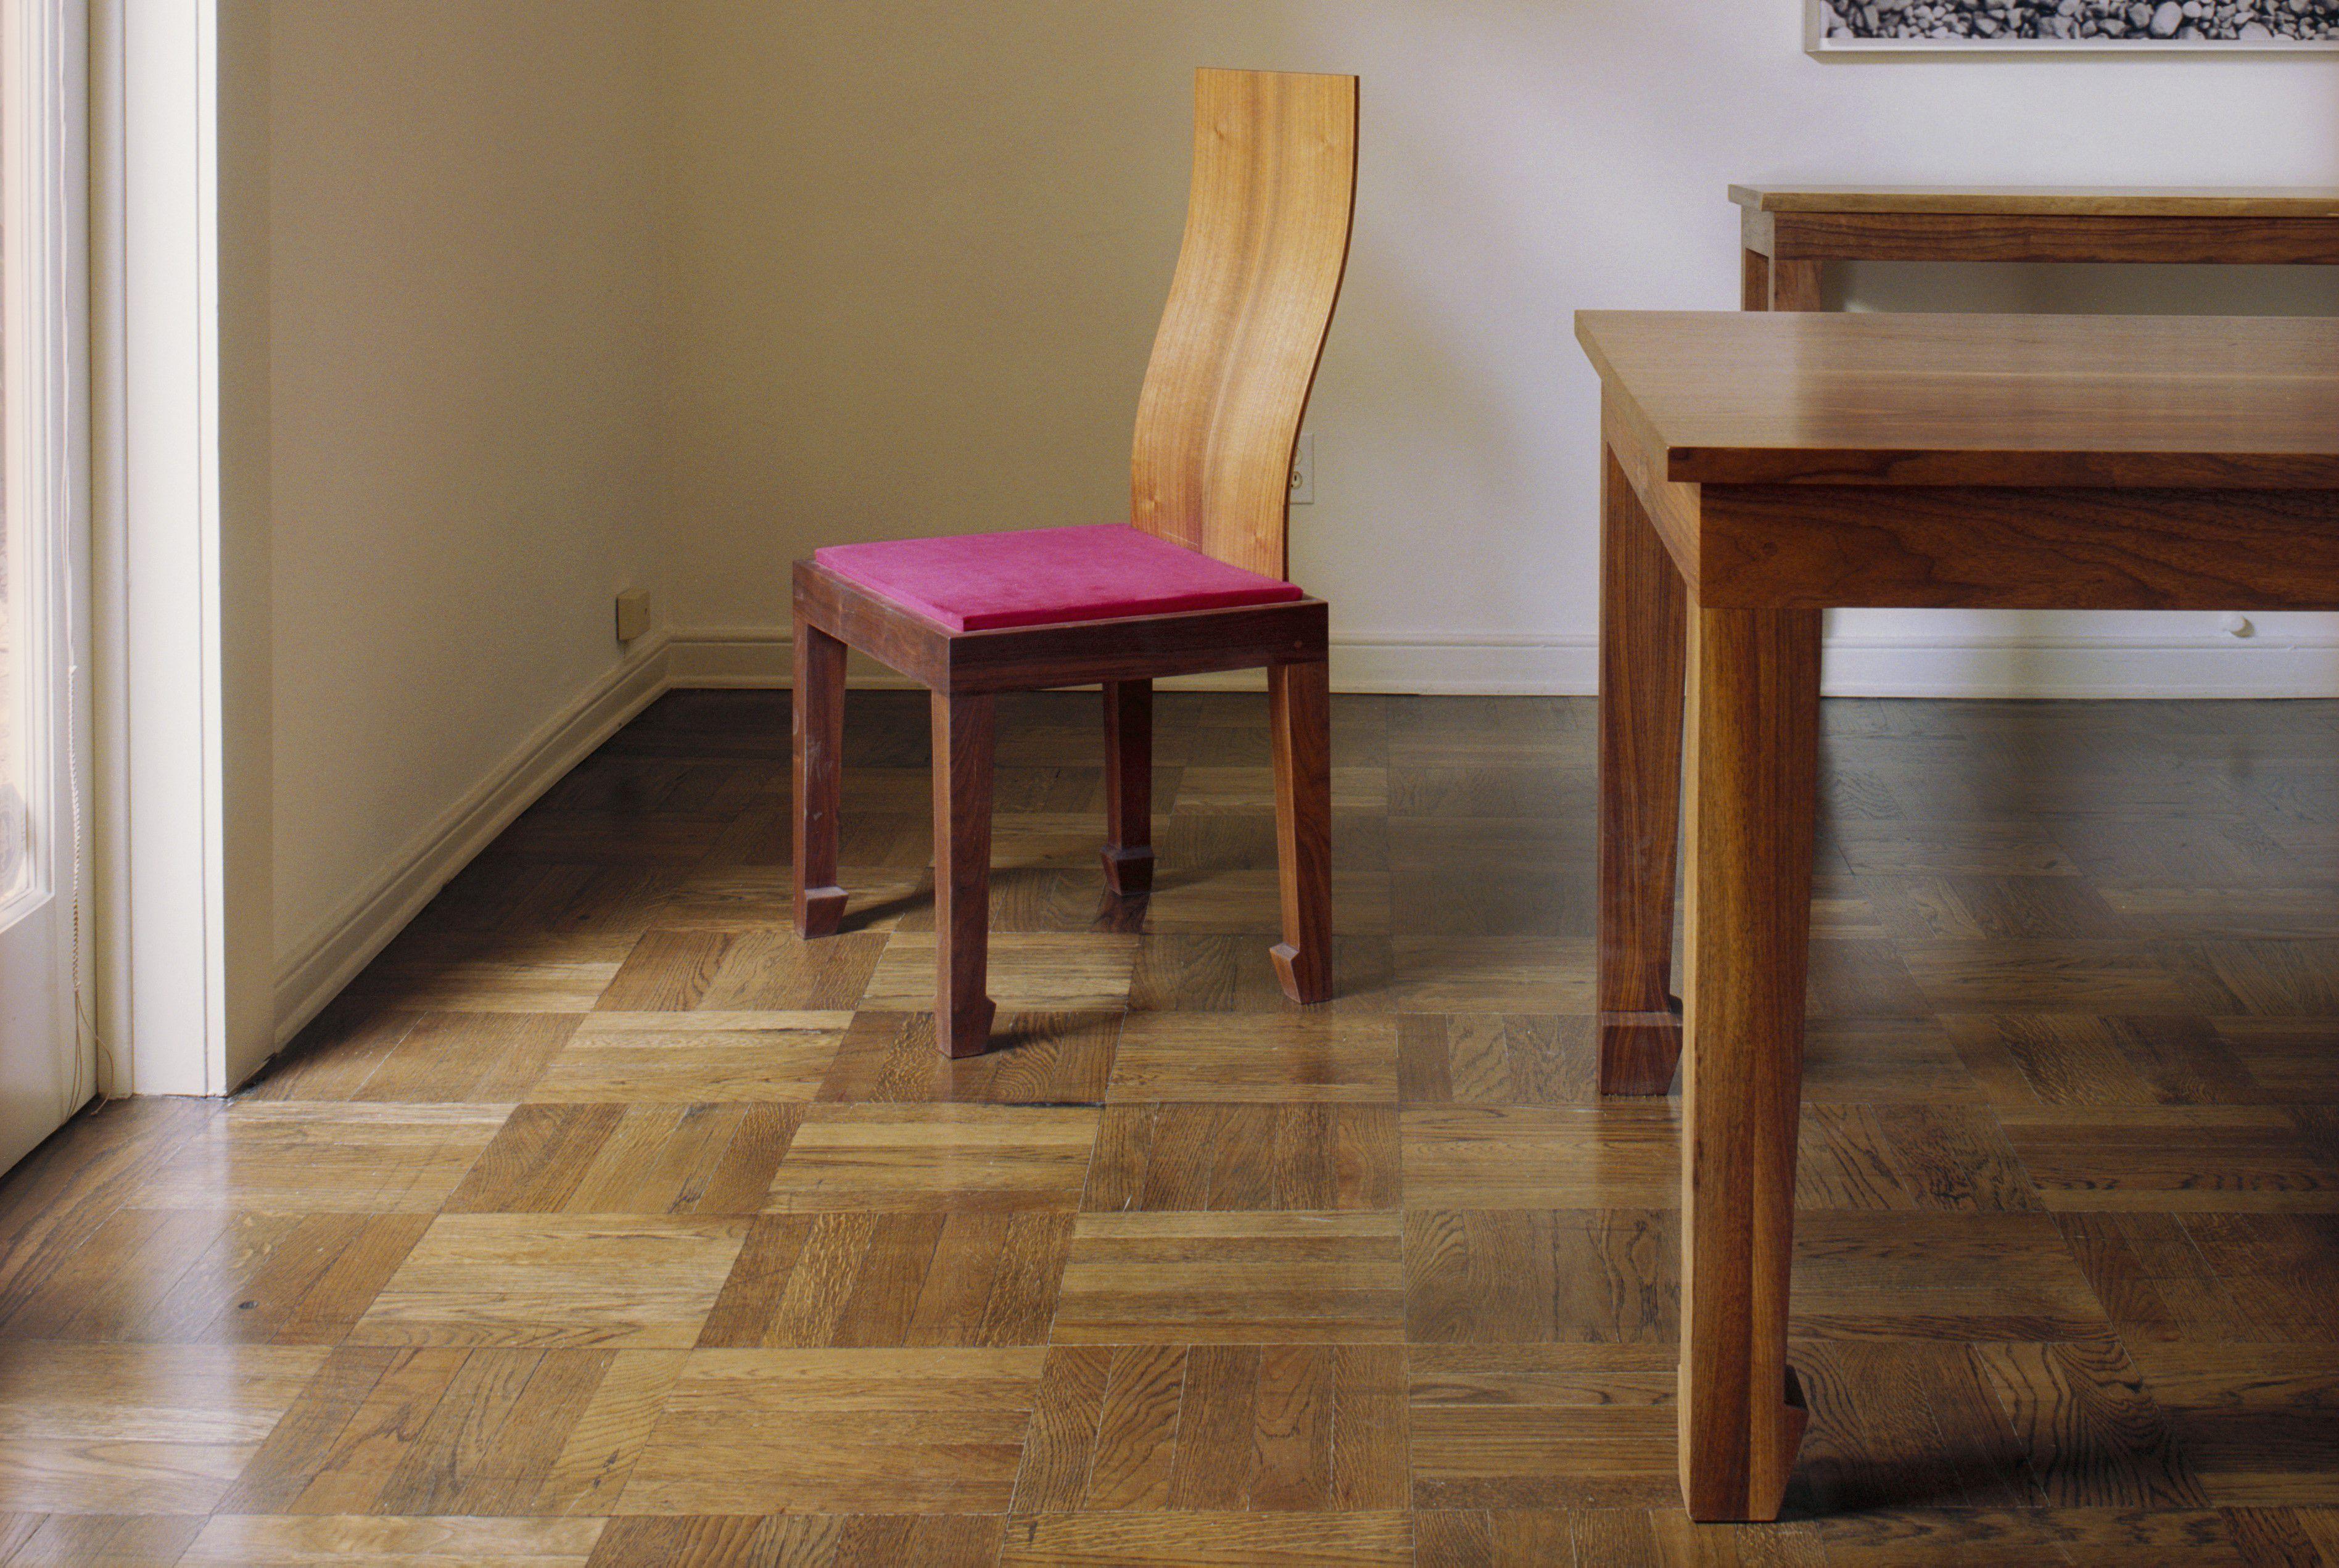 hardwood floor refinishing bloomington il of wood parquet flooring poised for a resurgence with regard to wood parquet flooring 529502452 576c78195f9b585875a1ac13